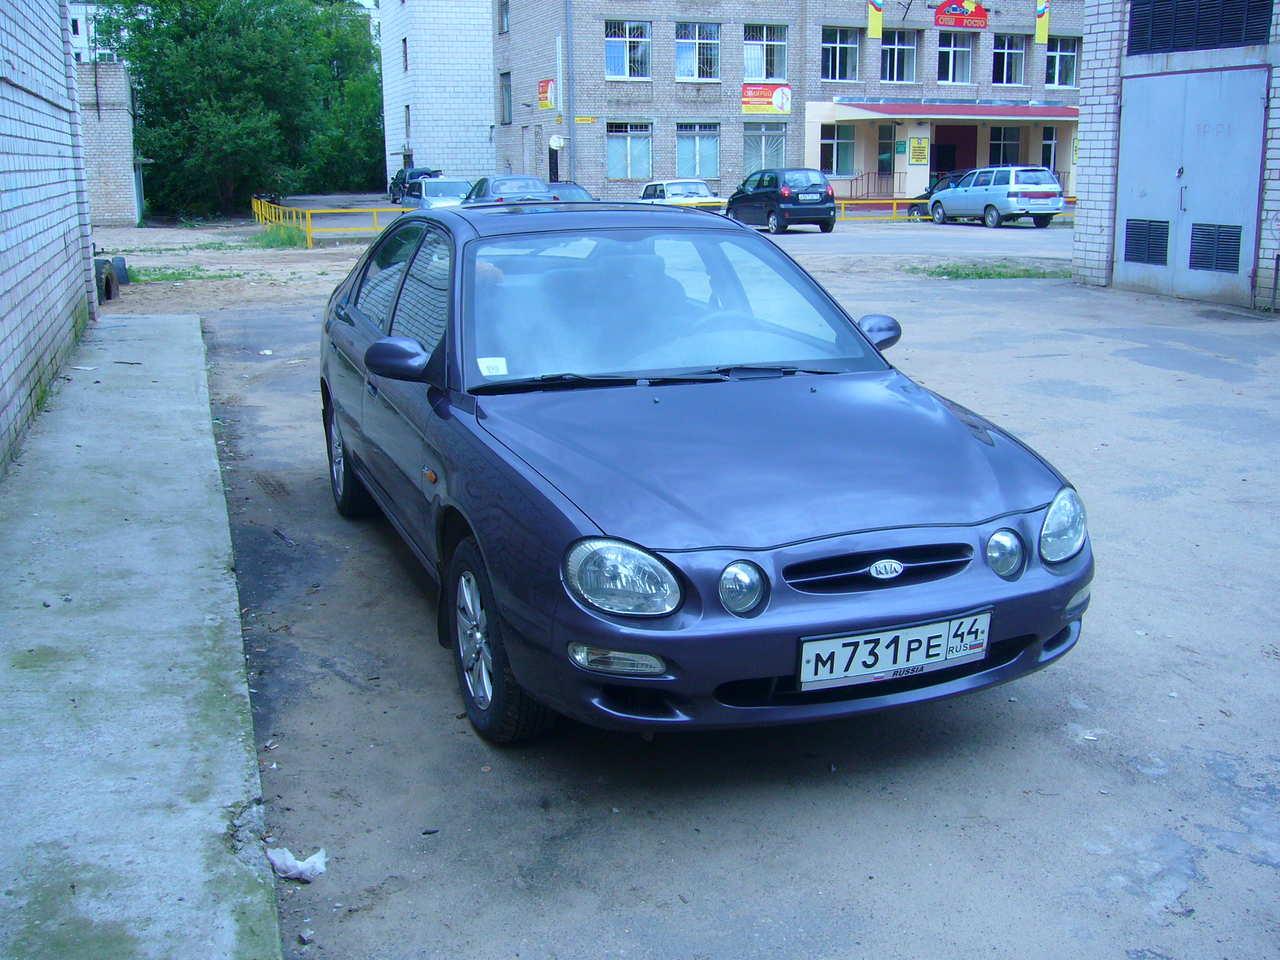 1999 kia shuma pictures 1500cc gasoline ff manual for sale rh cars directory net Kia Sorento kia sephia 1998 manual